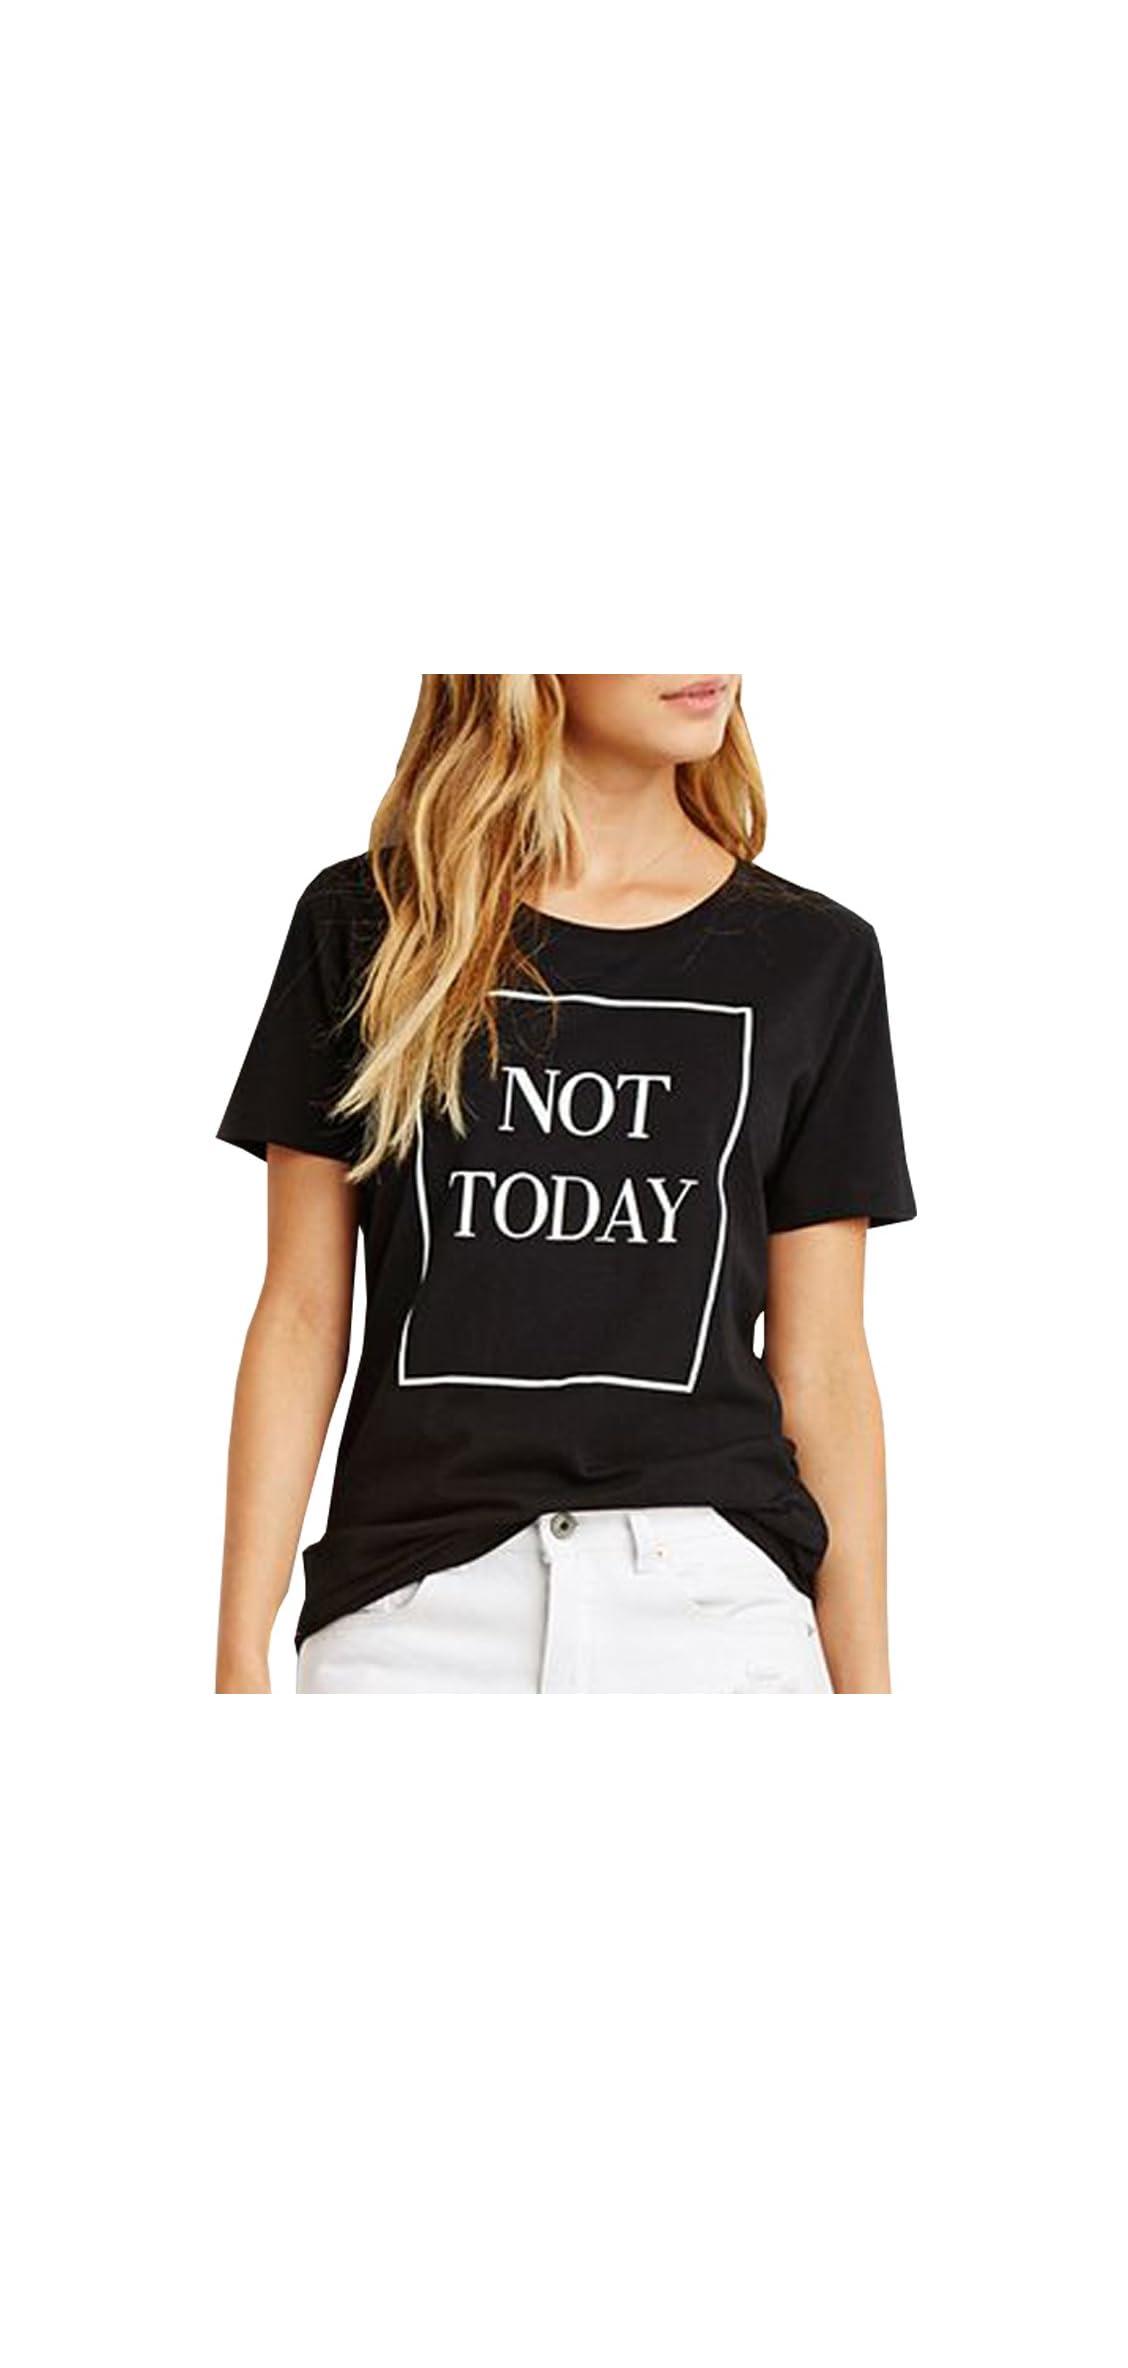 Women's Graphic Funny T Shirt Cute Tops Teen Girl Tees